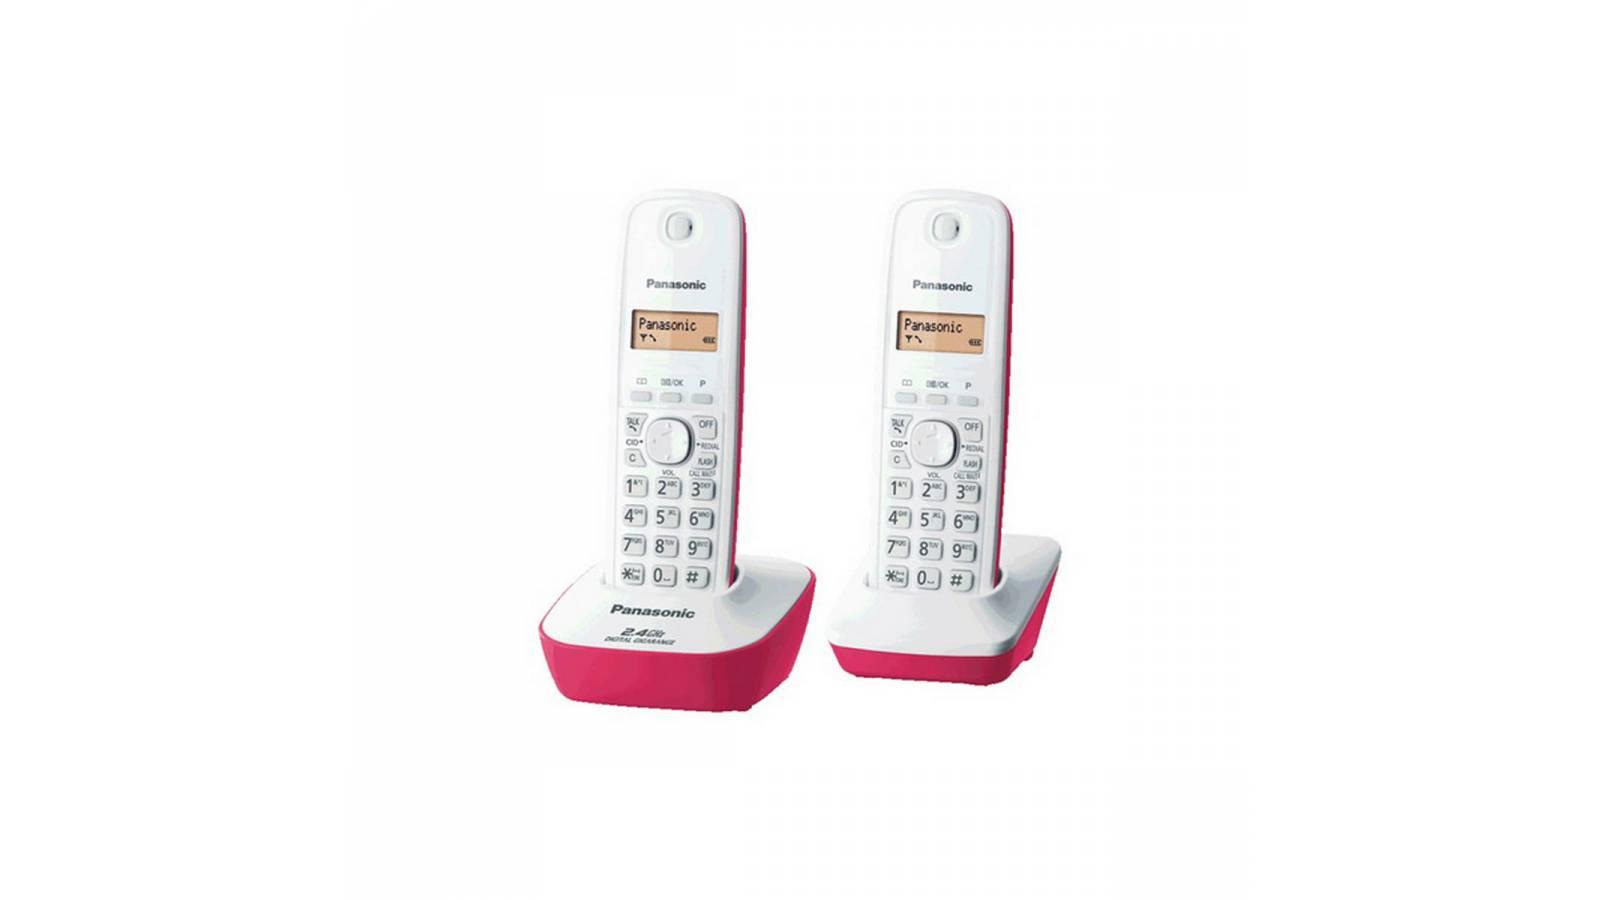 Teléfono Inalámbrico Panasonic KX-TG3412BXP Super Oferta